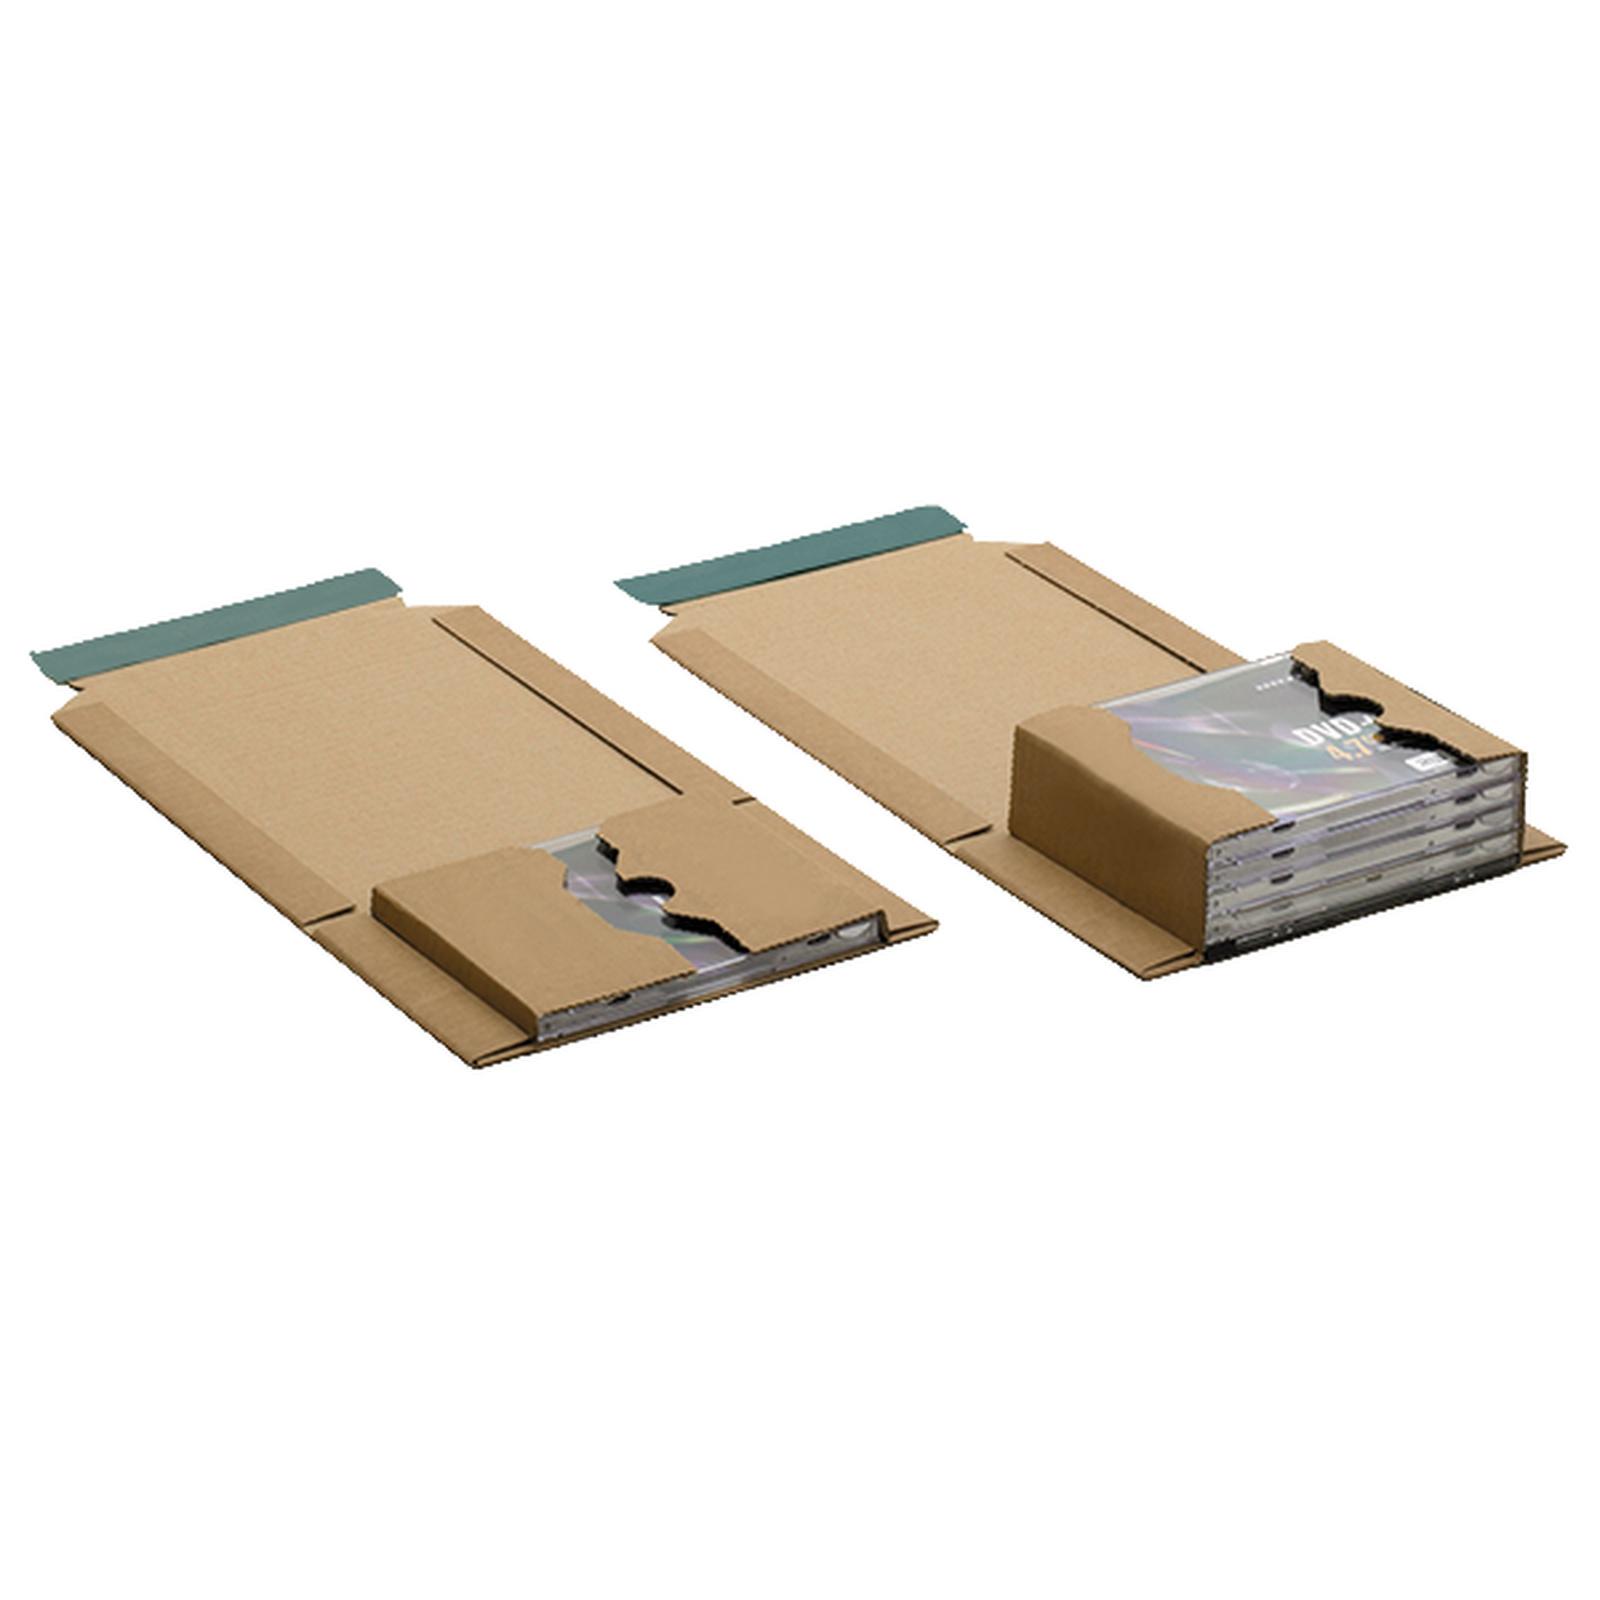 cd buchverpackung 147x129x0 55 mm g nstig kaufen 0 30. Black Bedroom Furniture Sets. Home Design Ideas